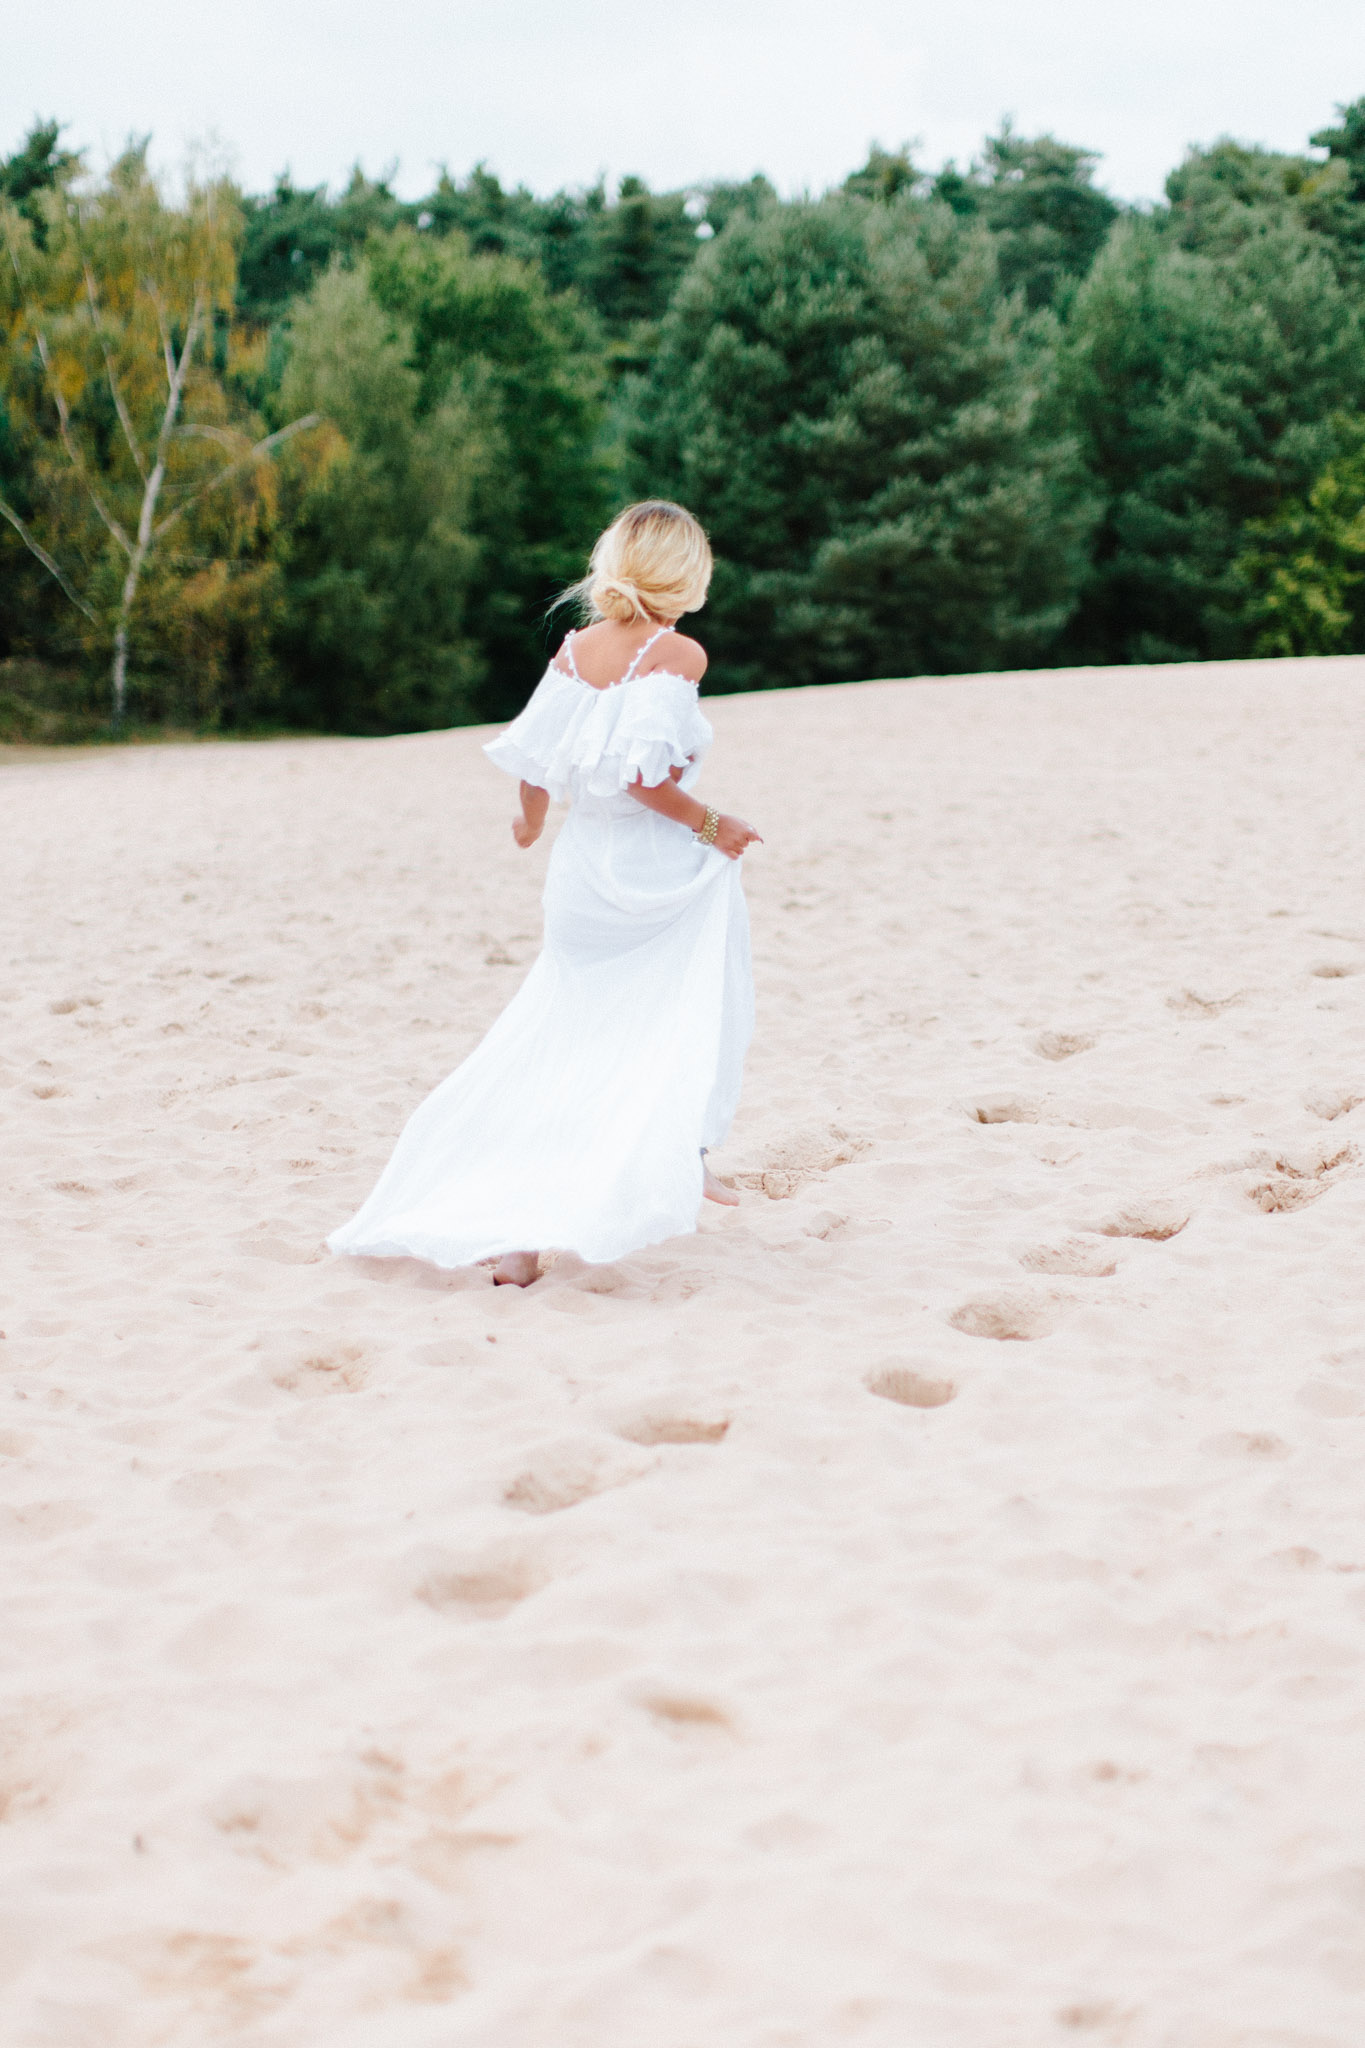 Speyer-Moroccan-Wedding-Inspiration-Pia-Anna-Christian-Wedding-Photography-S-32.jpg